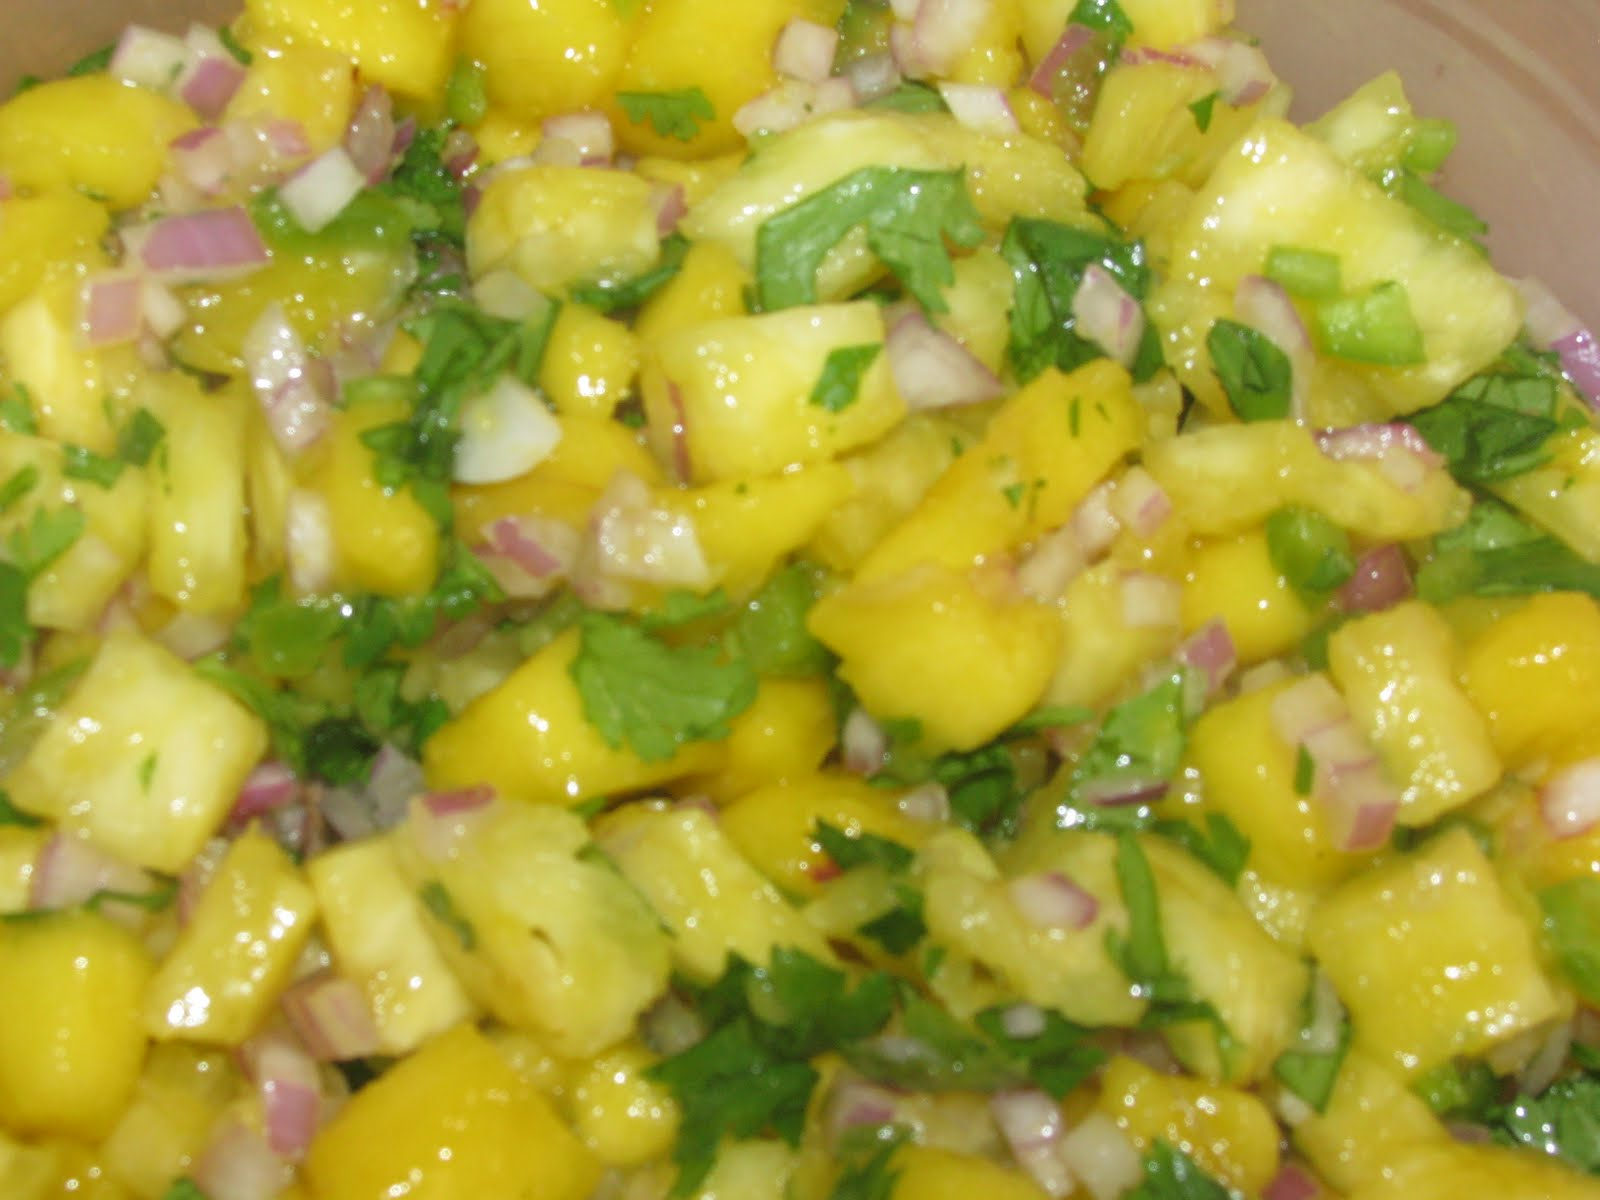 Shamrocks and Shenanigans: Pineapple Mango Salsa